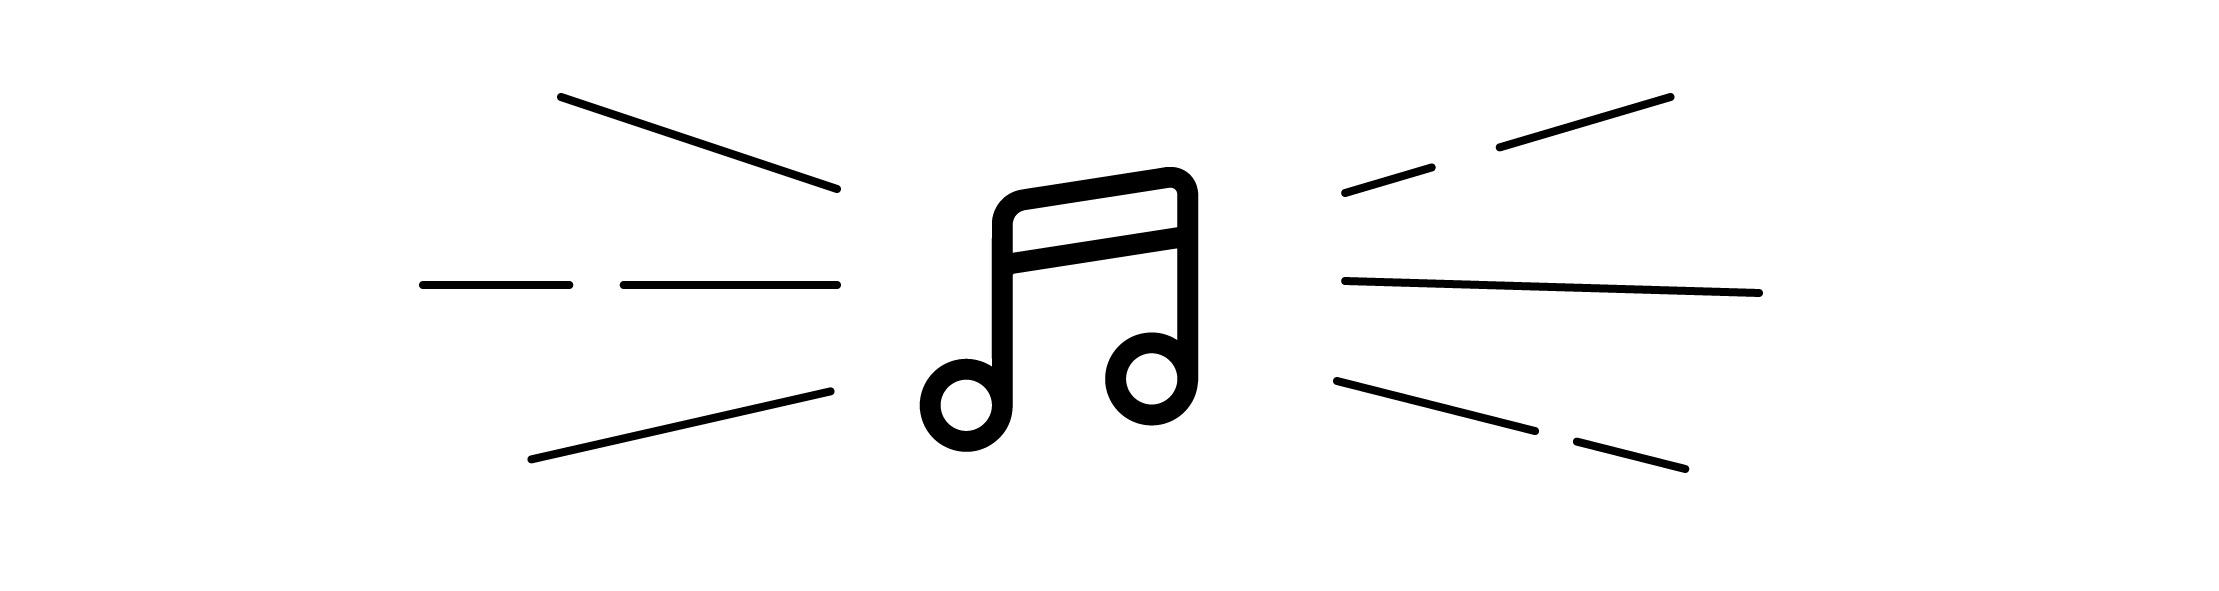 bct-quick-start-Artboard 6 copy2.png